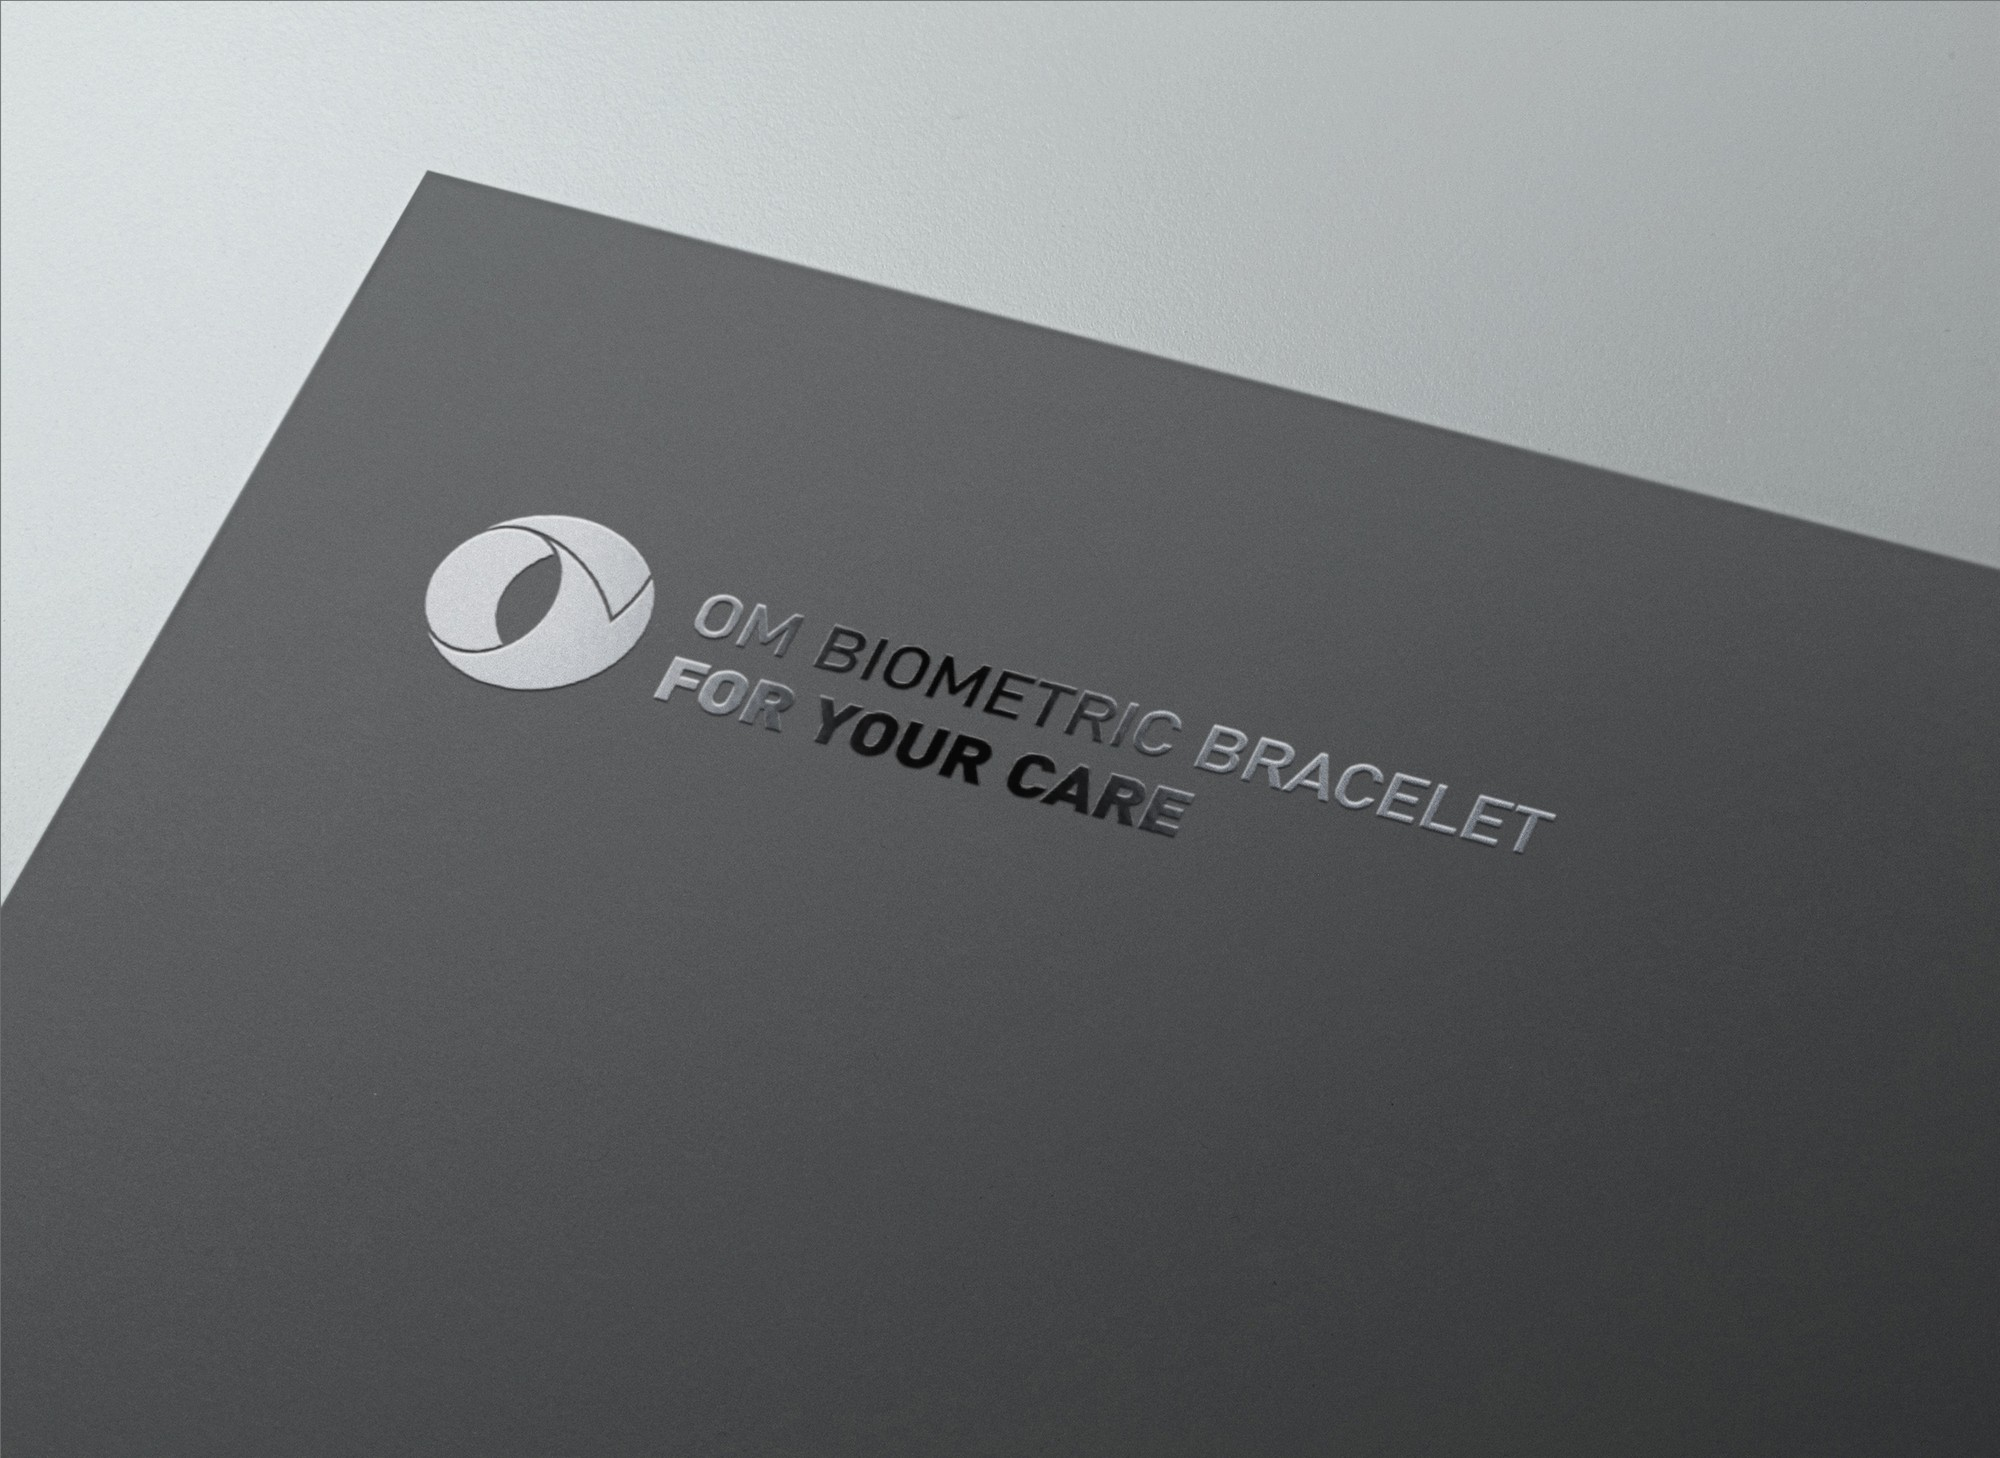 om_logotype_remion_design_branding_identity_13